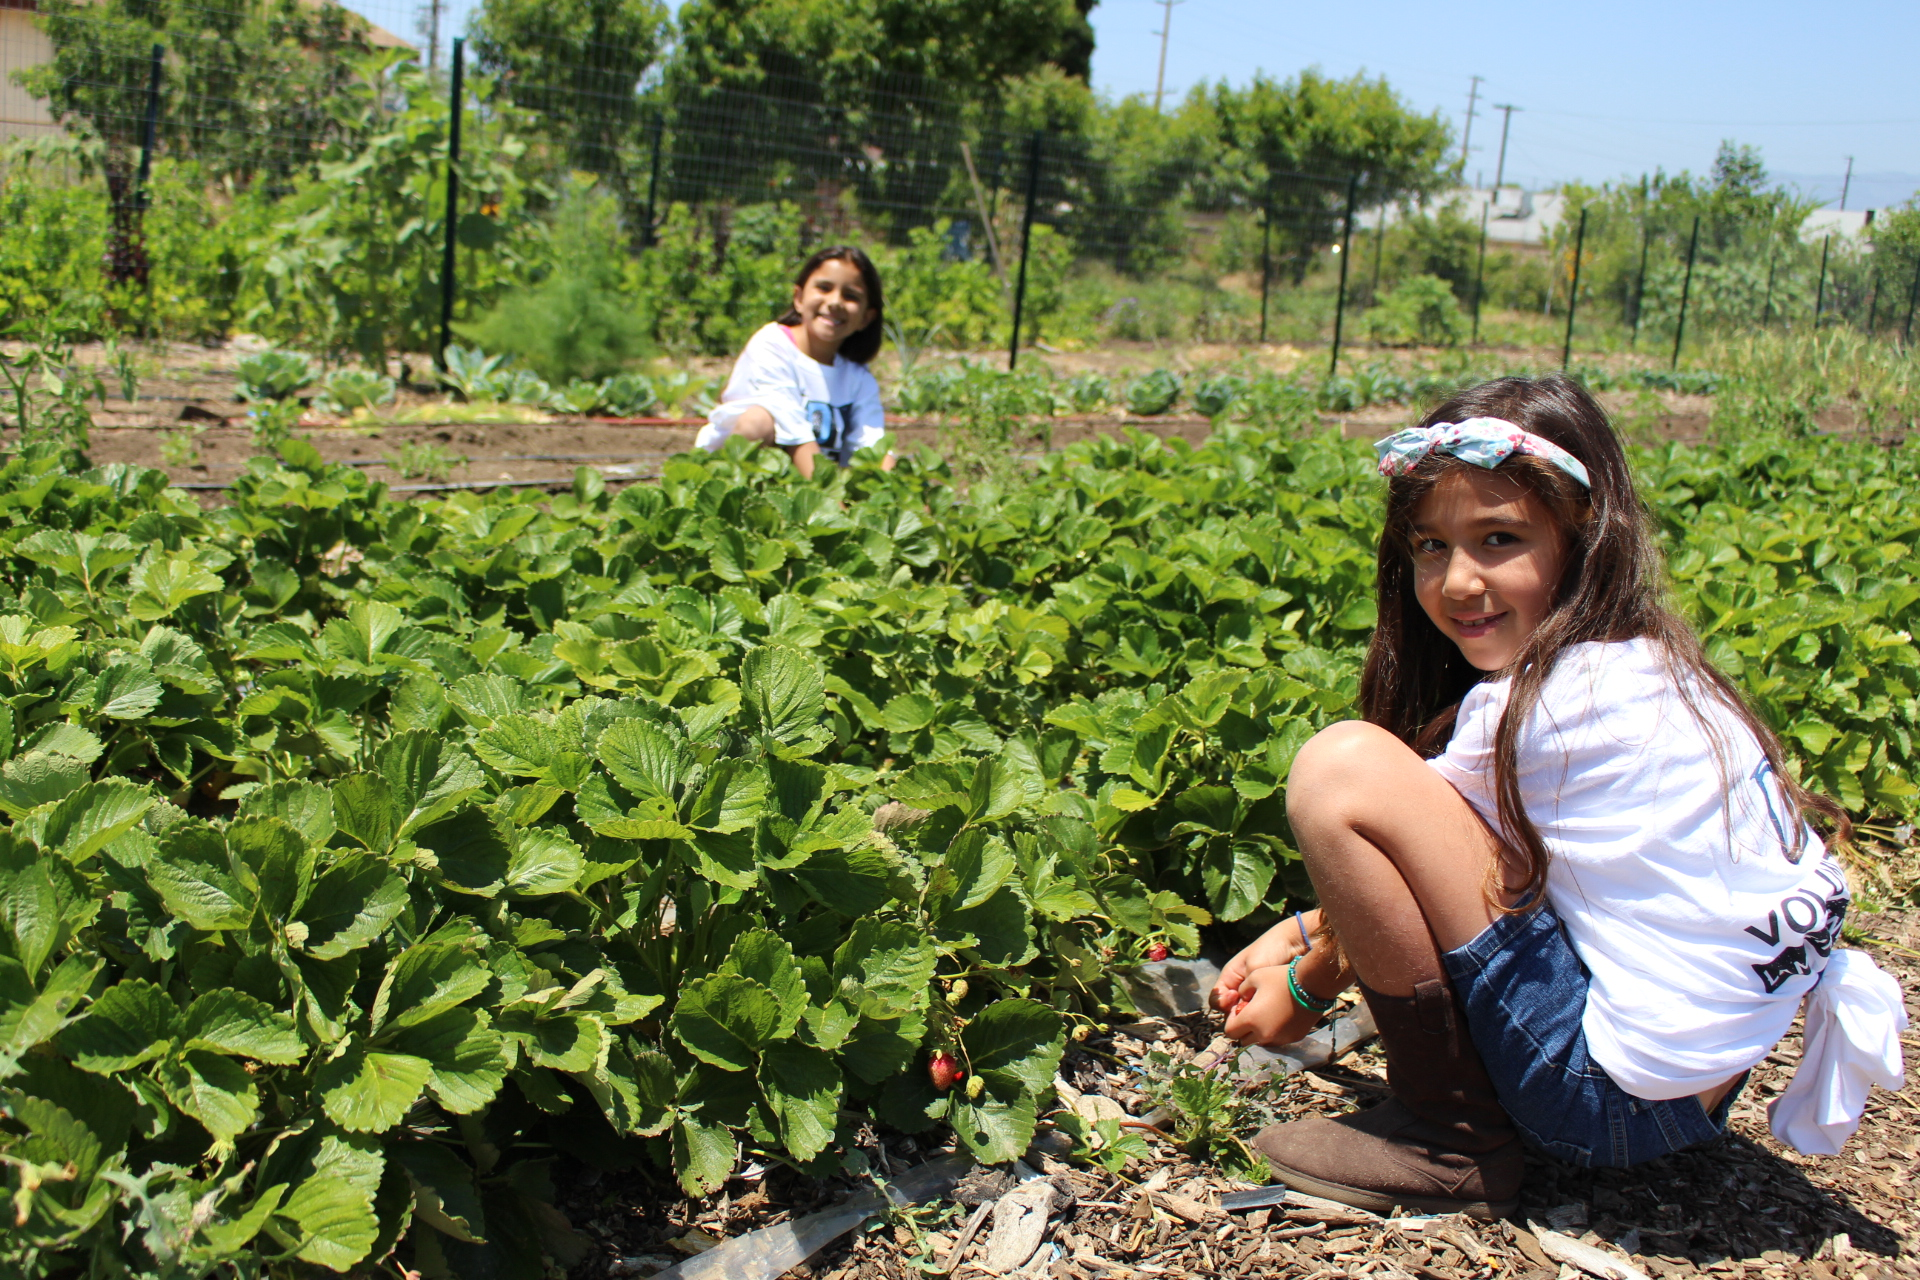 Cool Daughters gardening for healthier communities